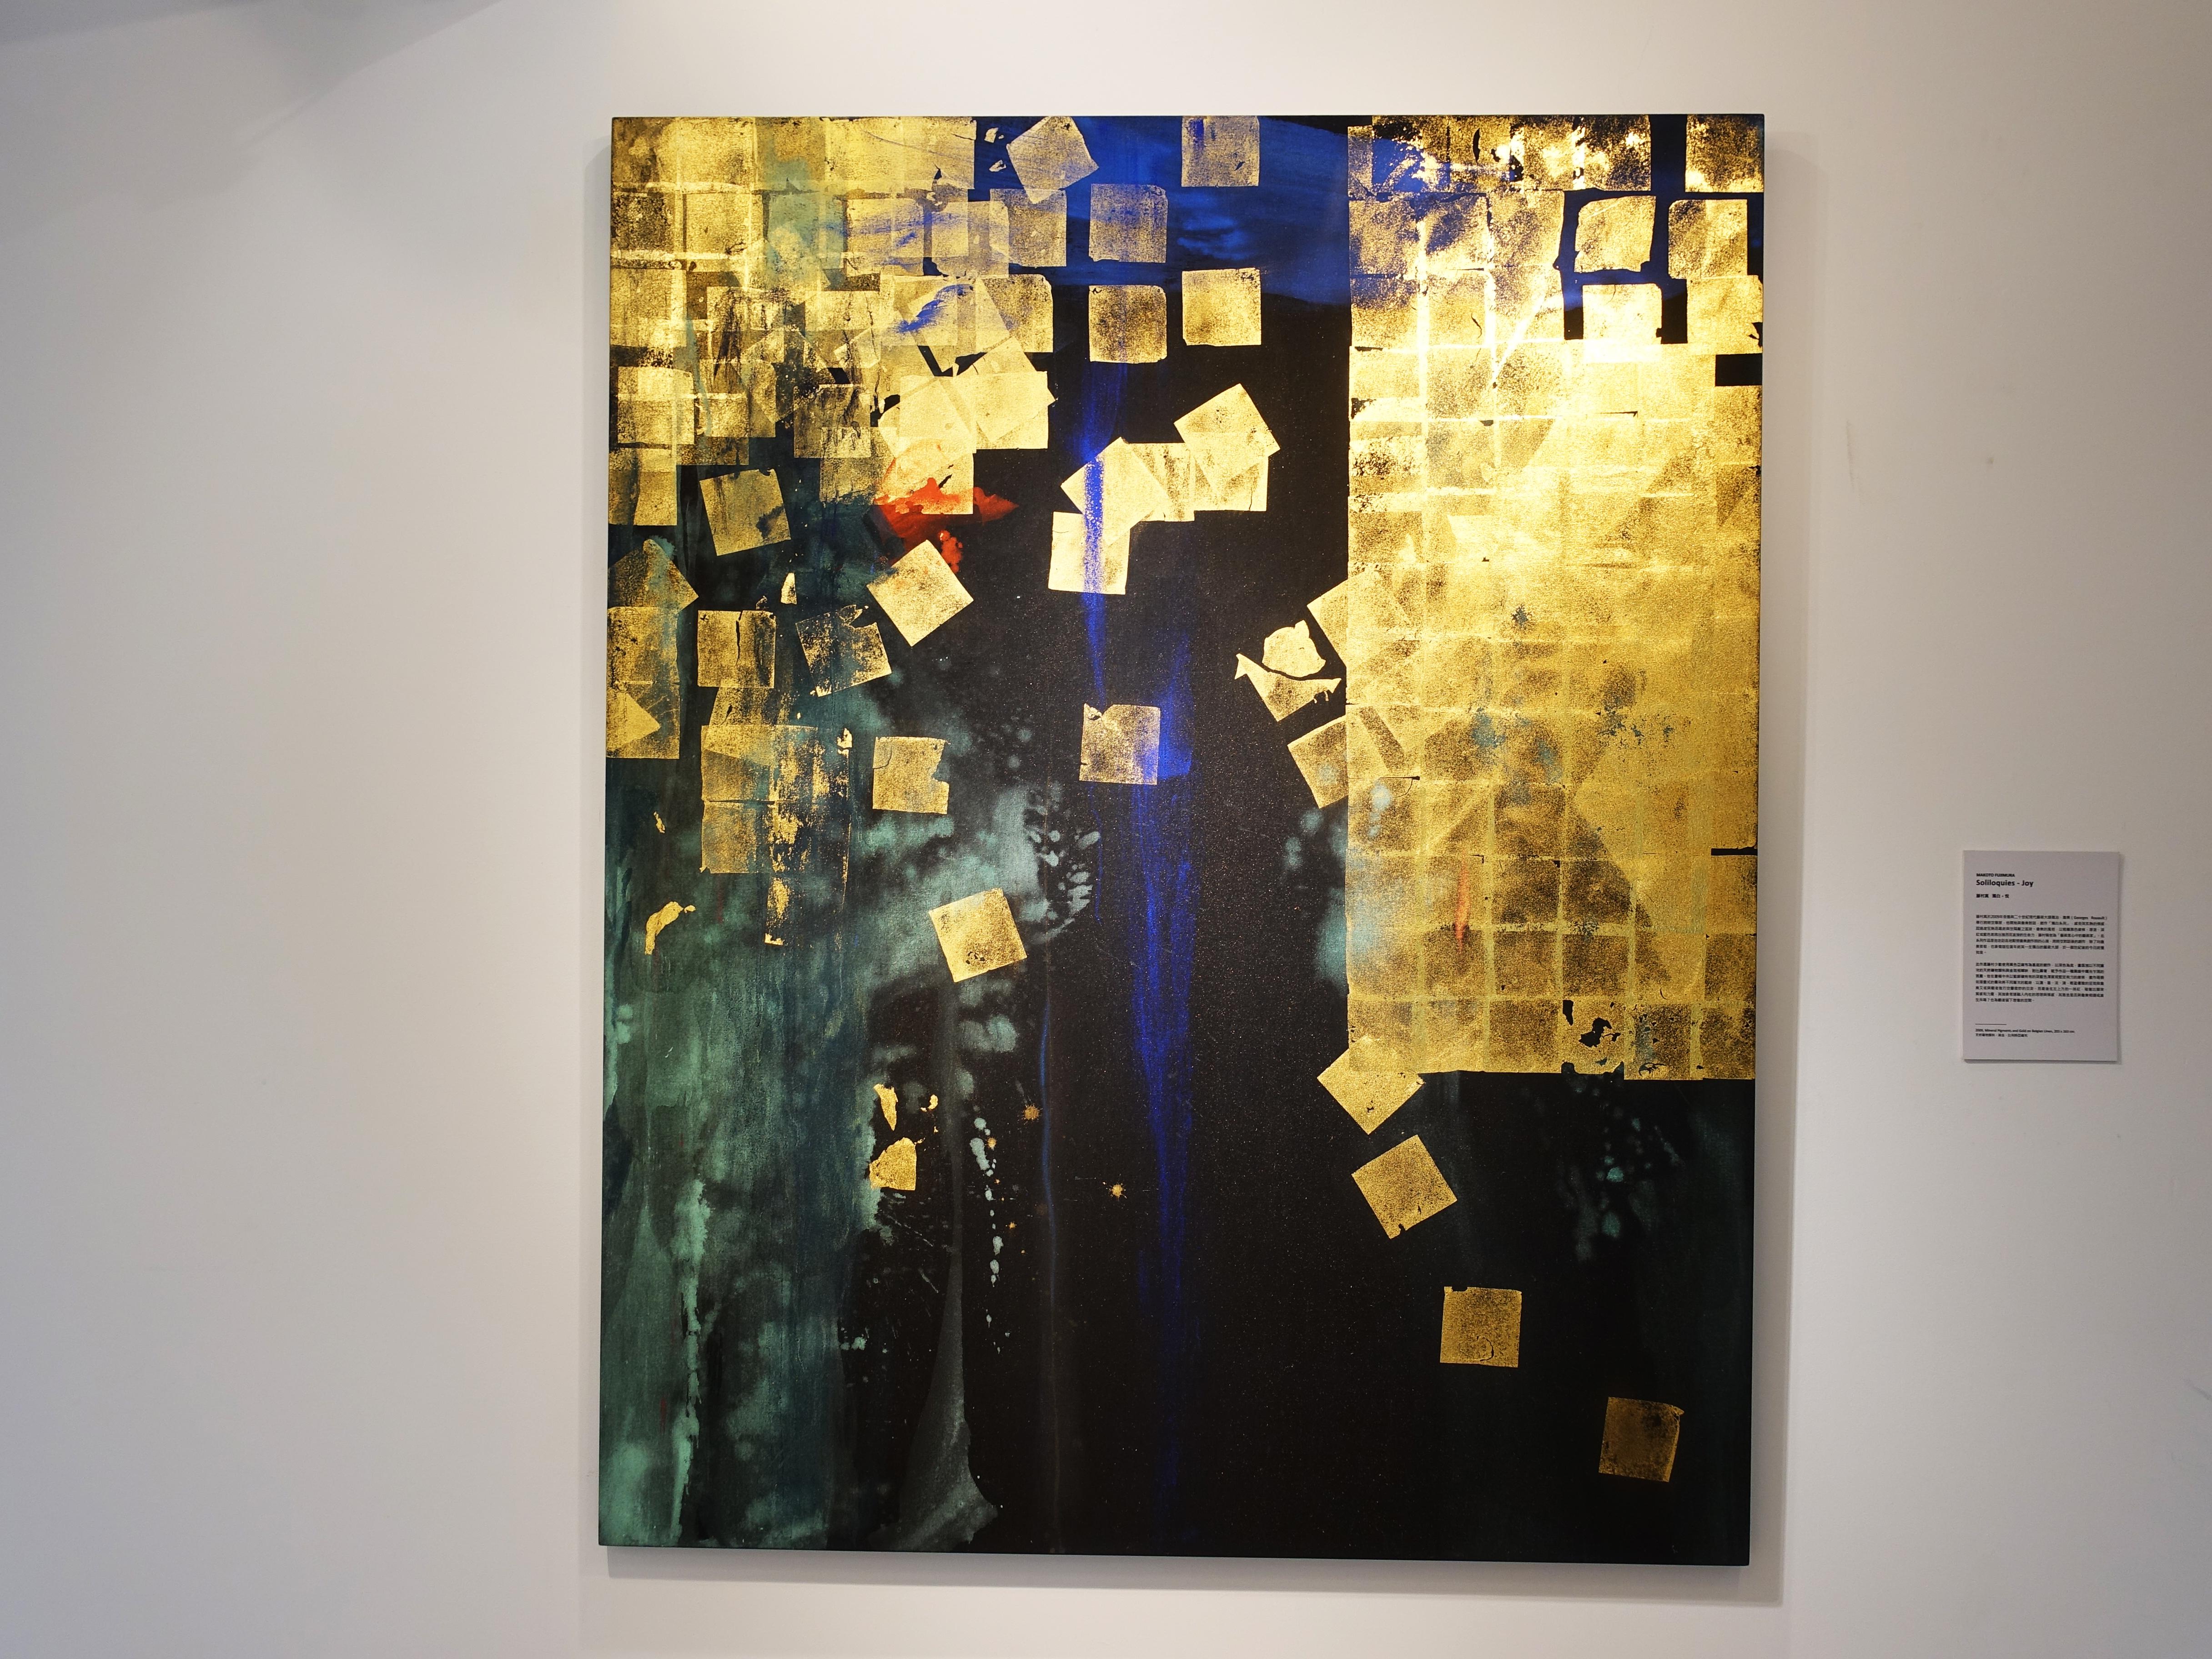 Makoto Fujimura,《Soliloquies - Joy》,203 x 163 cm,天然礦物顏料、金箔、比利時亞麻畫布,2009。